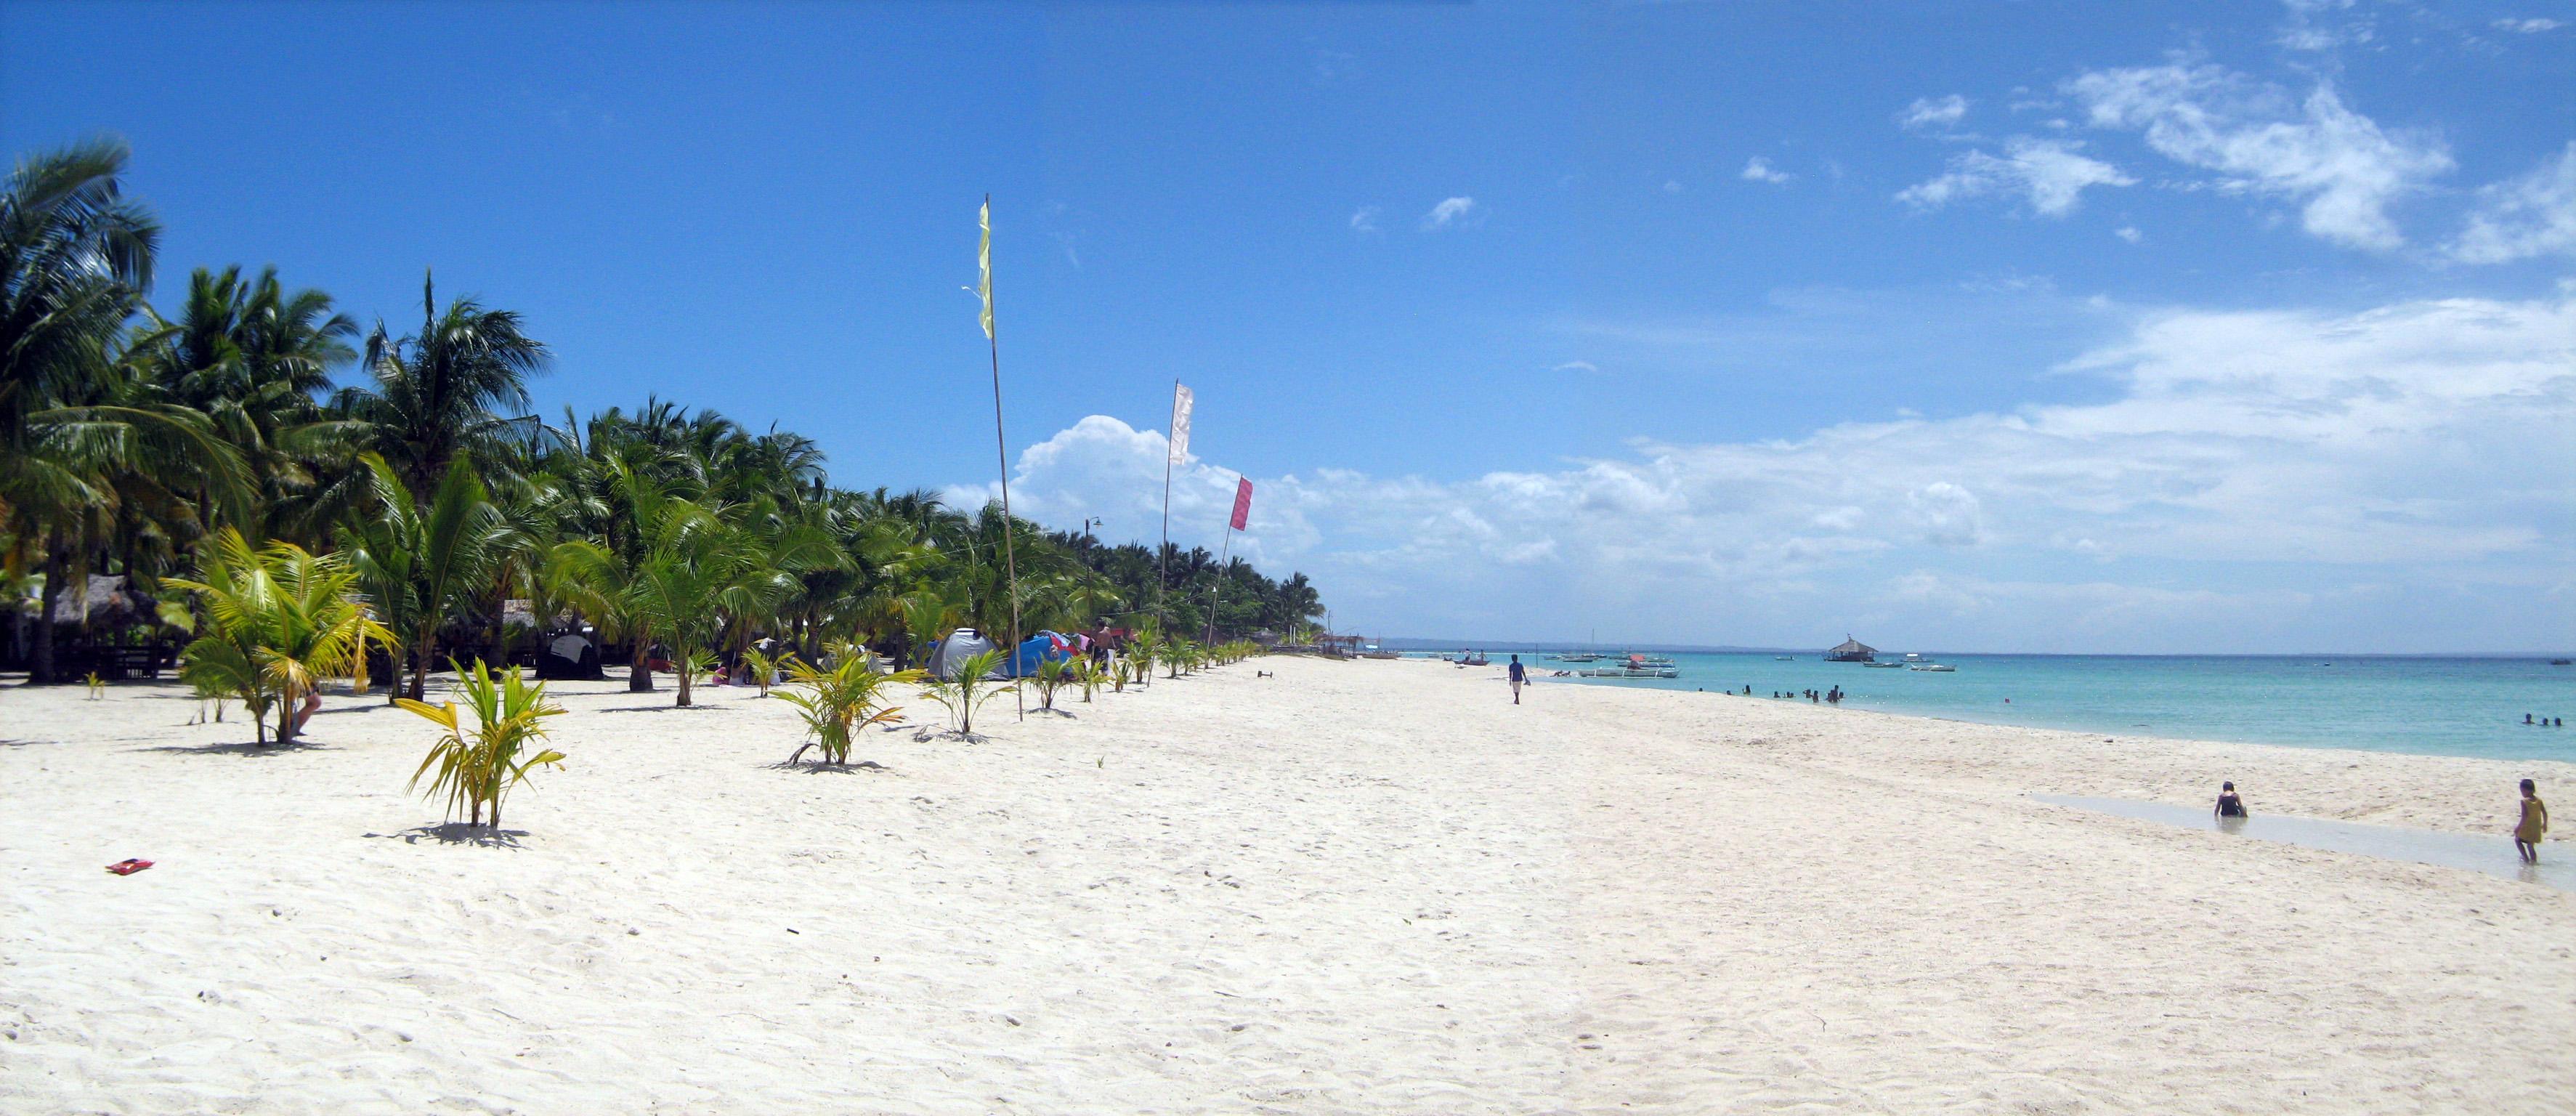 The Resort Aksa Beach Madh Marve Road Malad West